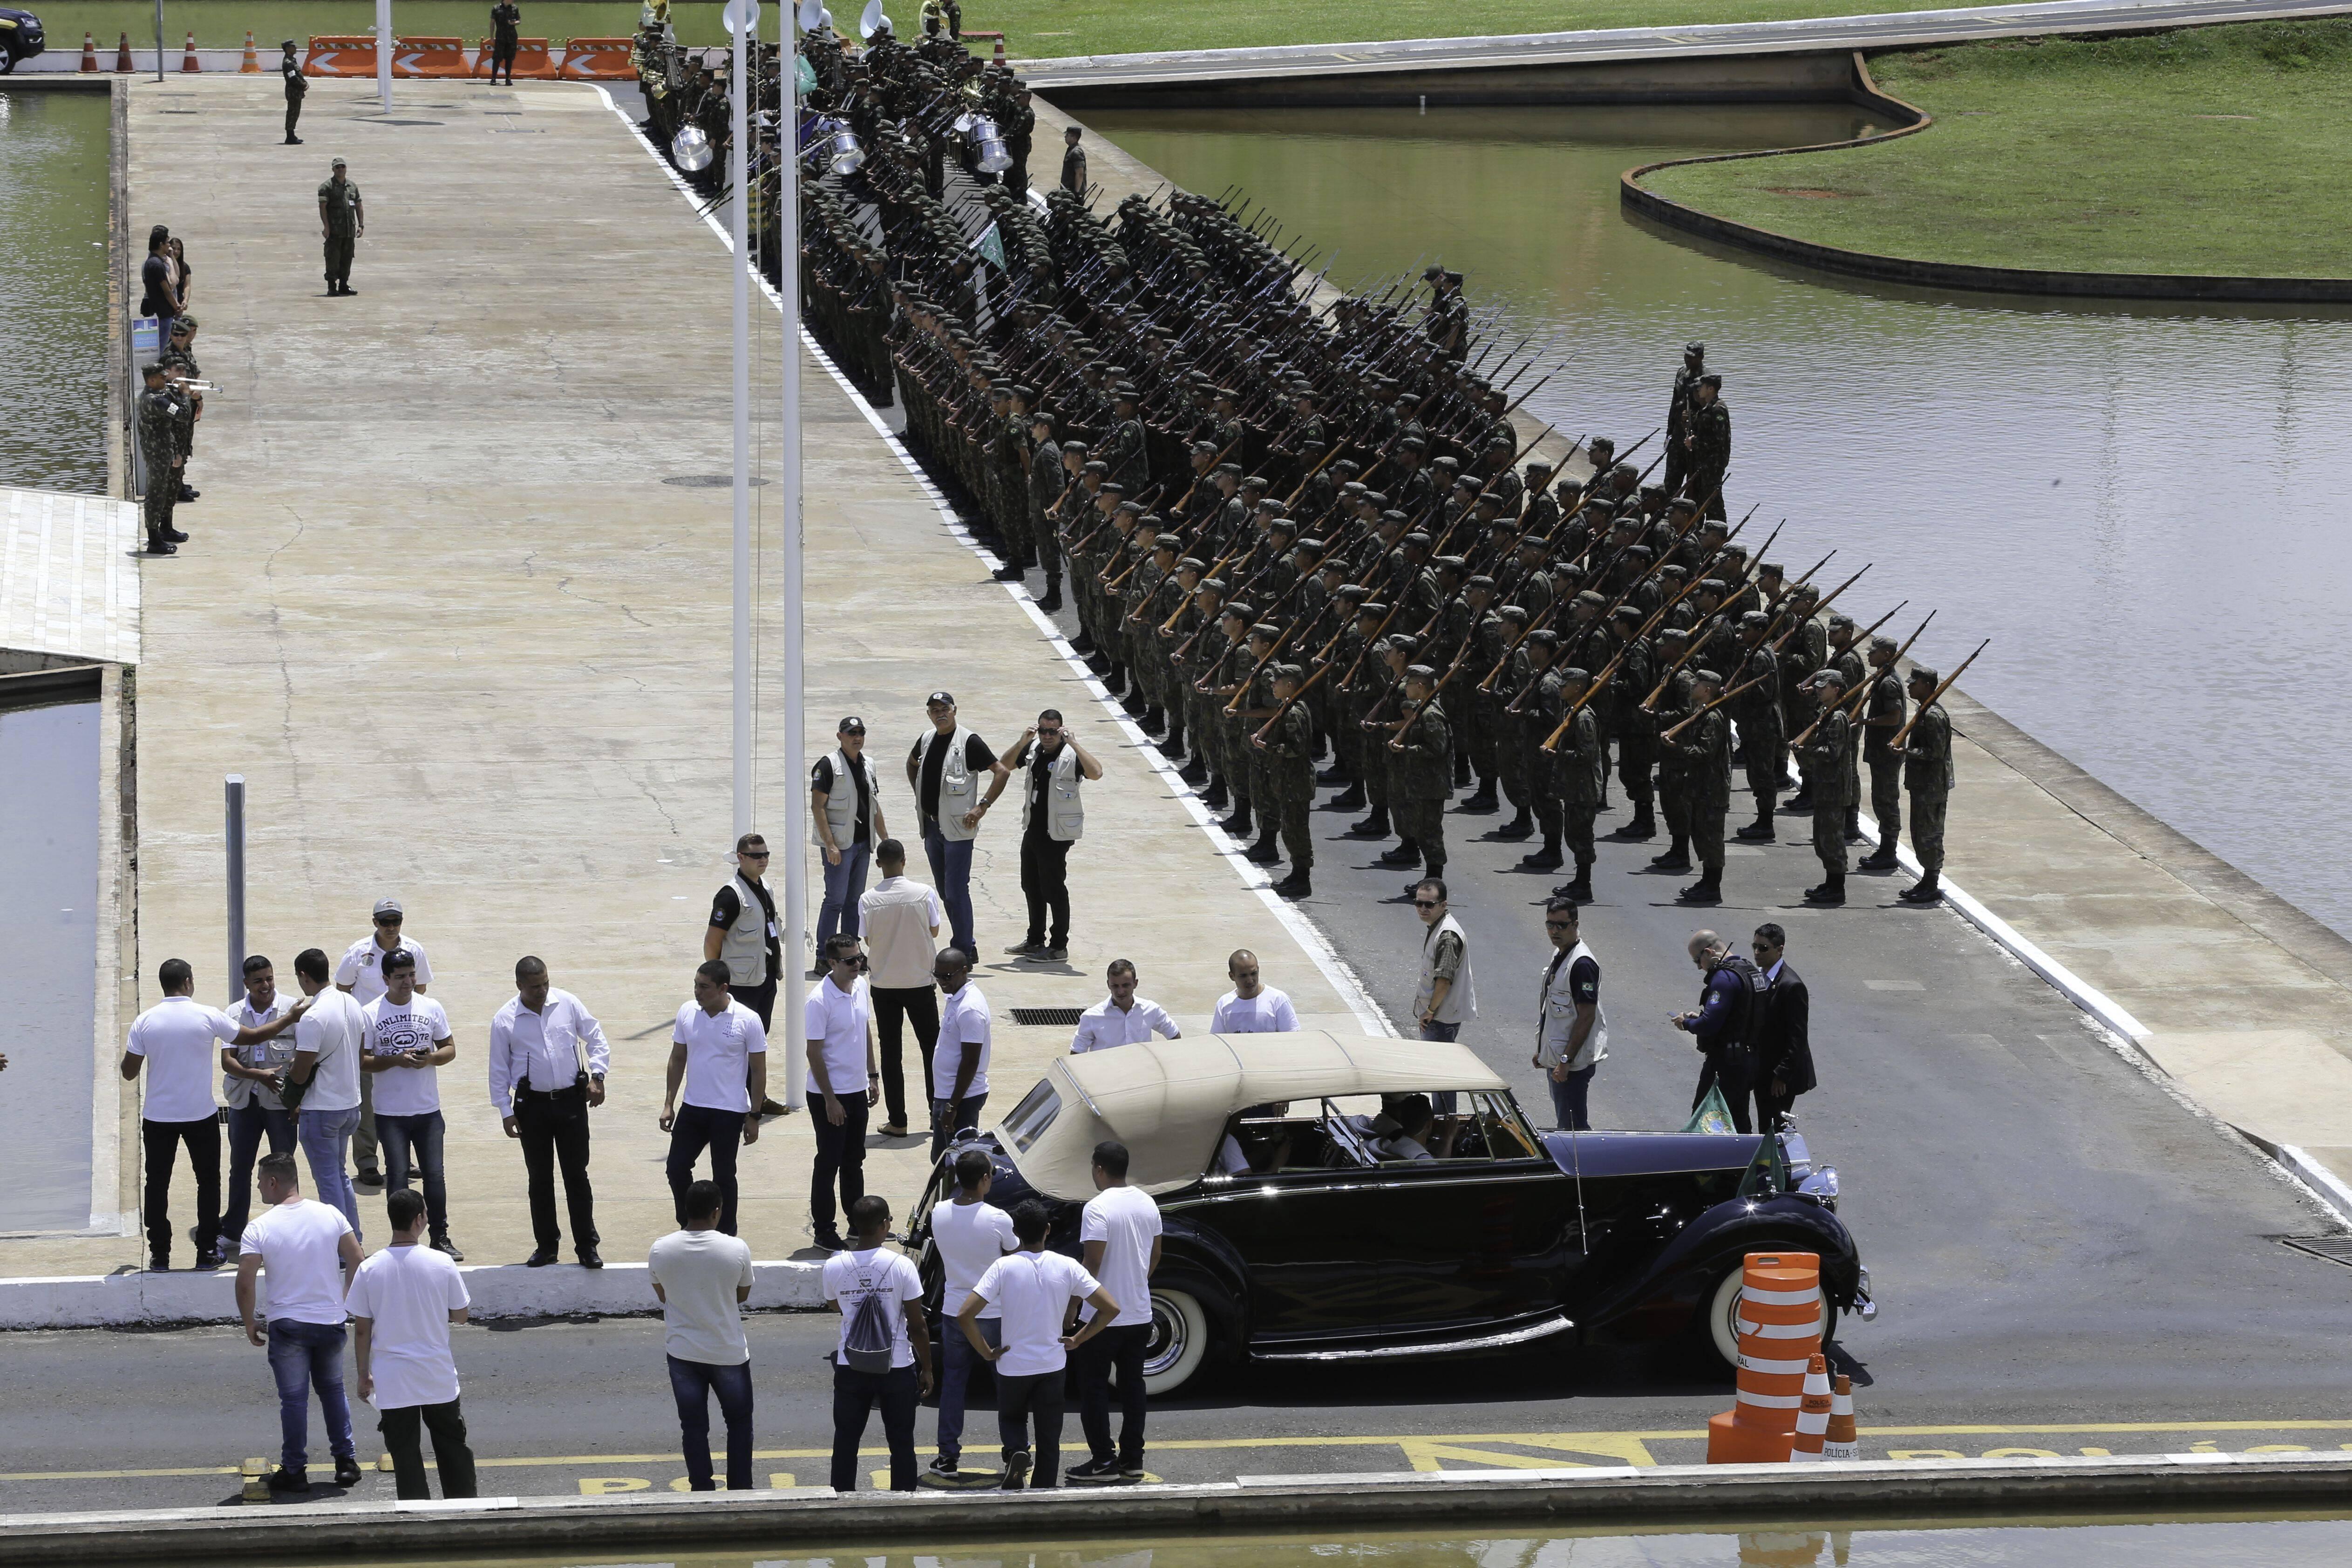 Ensaio para posse de Bolsonaro fecha Esplanada dos Ministérios . Foto: Fabio Rodrigues Pozzebom/Agência Brasil - 23.12.18